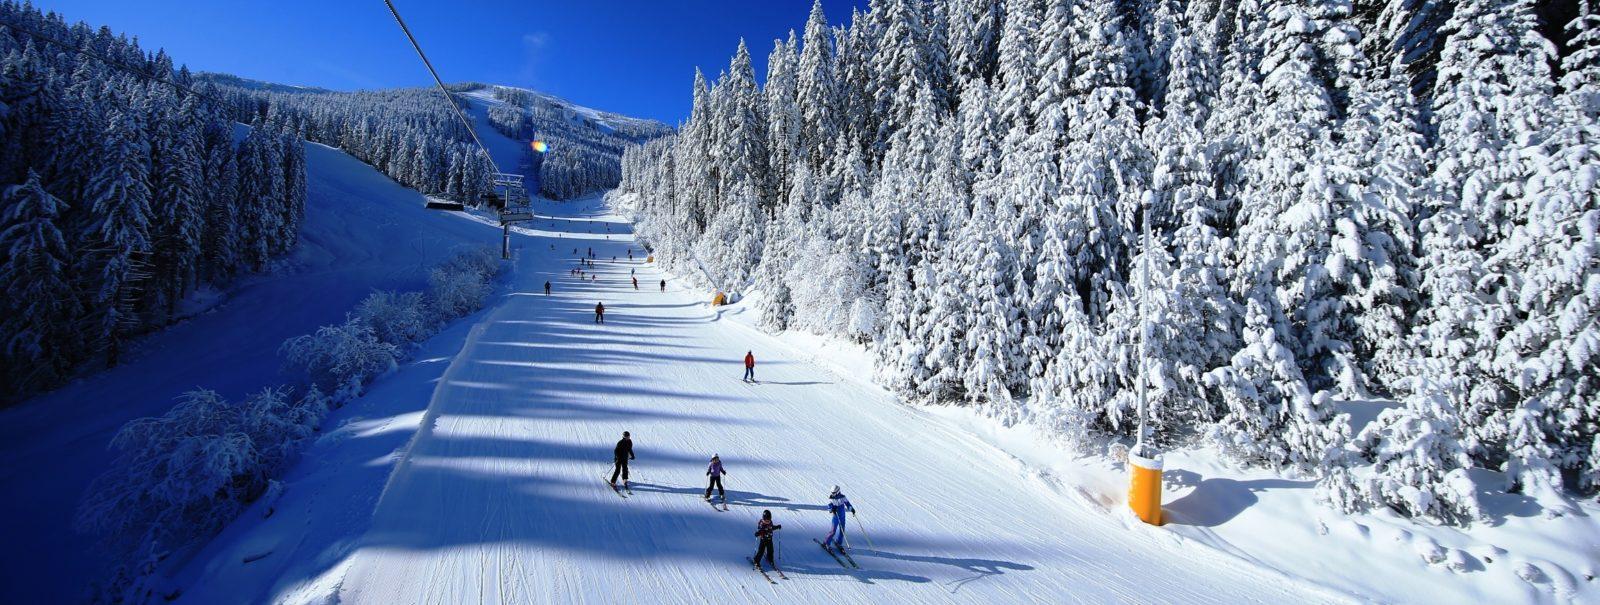 погода в болгарии зимой